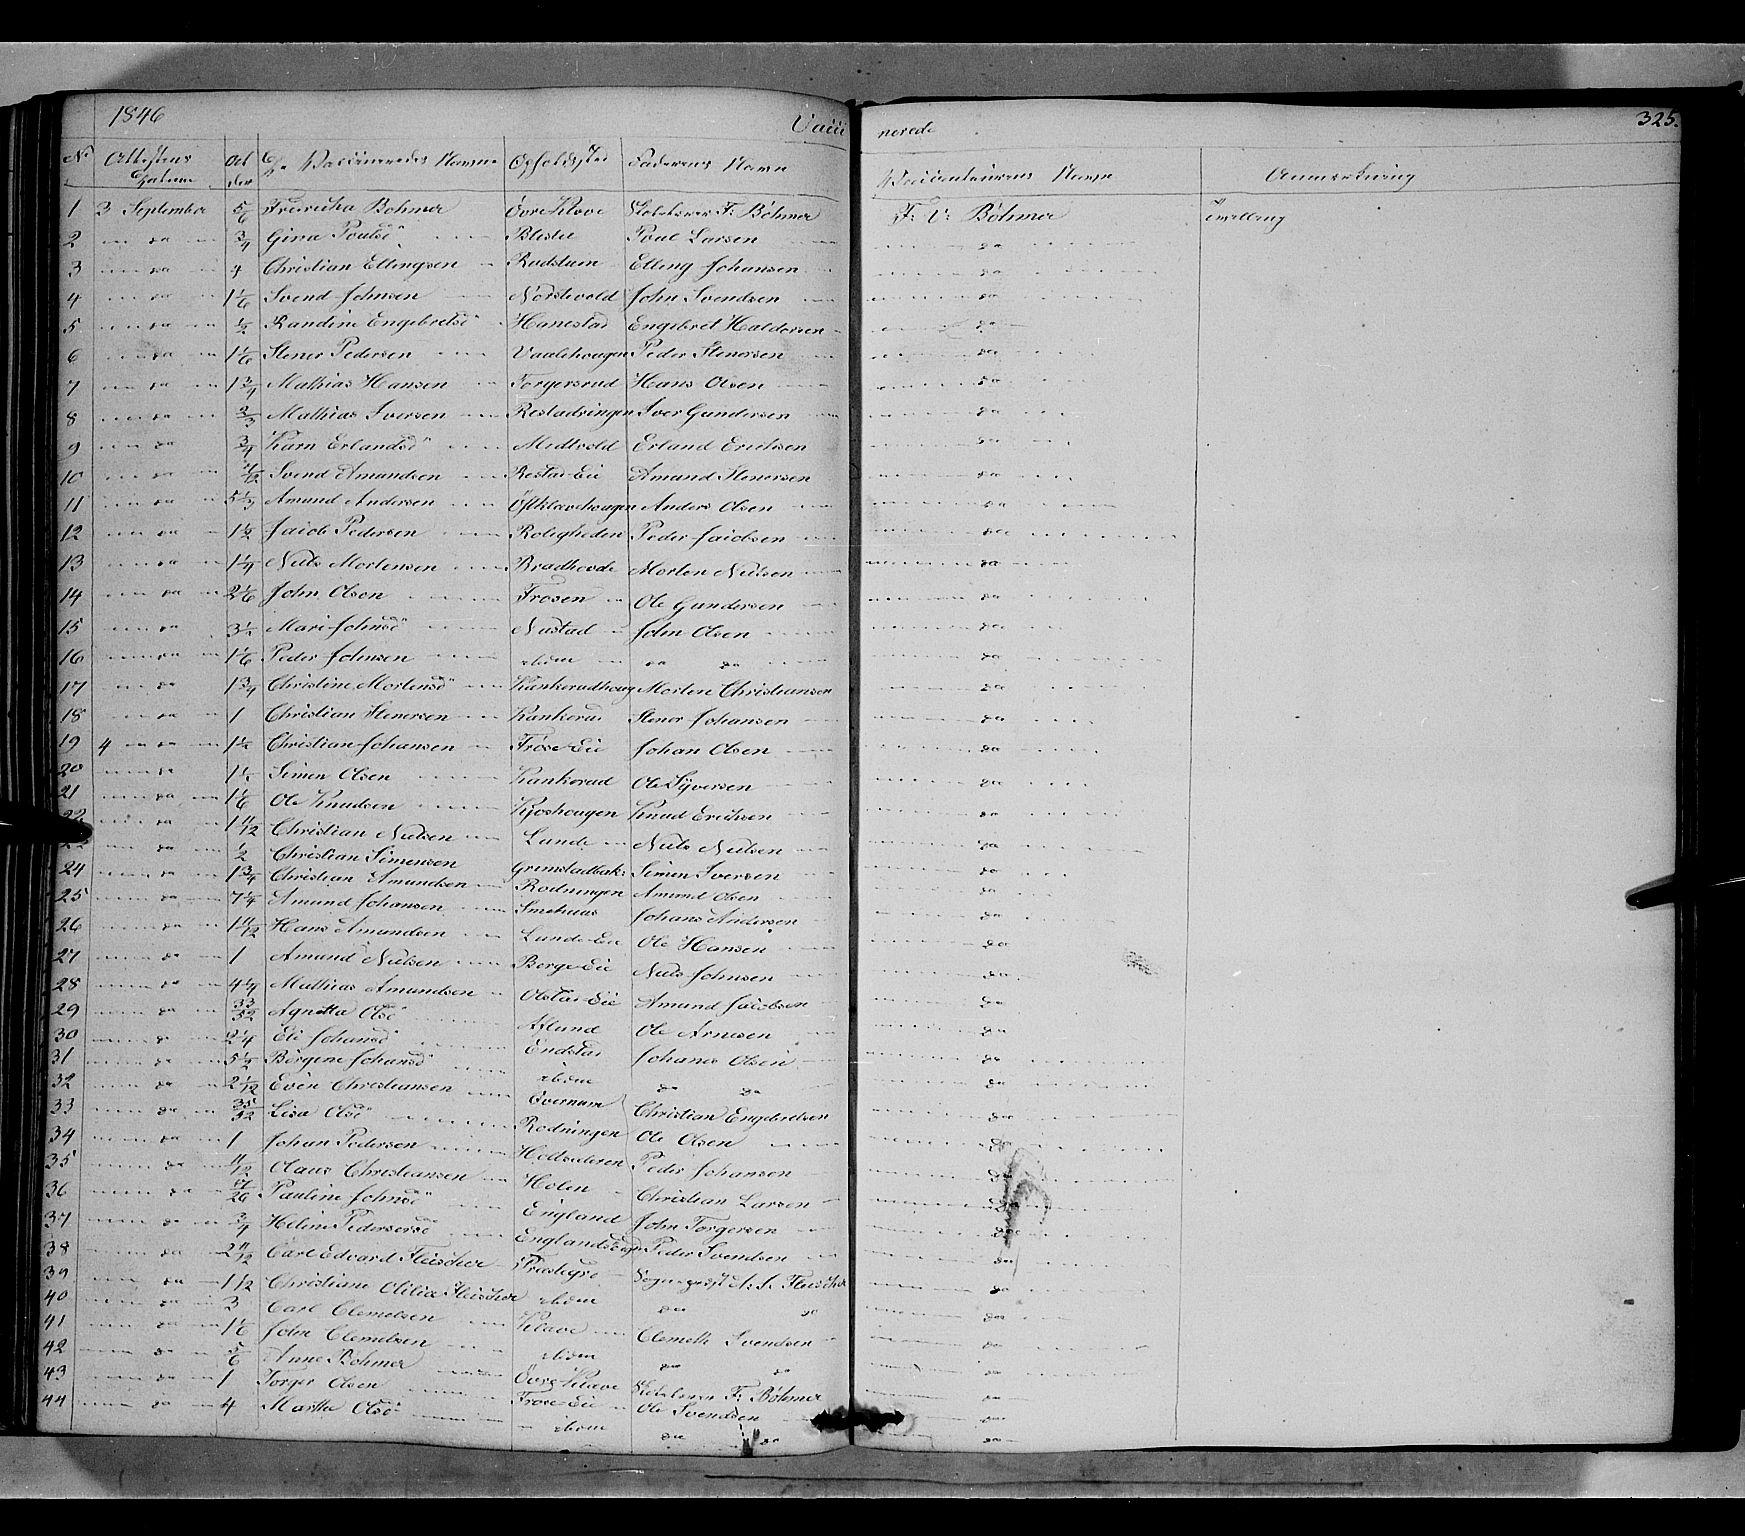 SAH, Gausdal prestekontor, Ministerialbok nr. 7, 1840-1850, s. 325